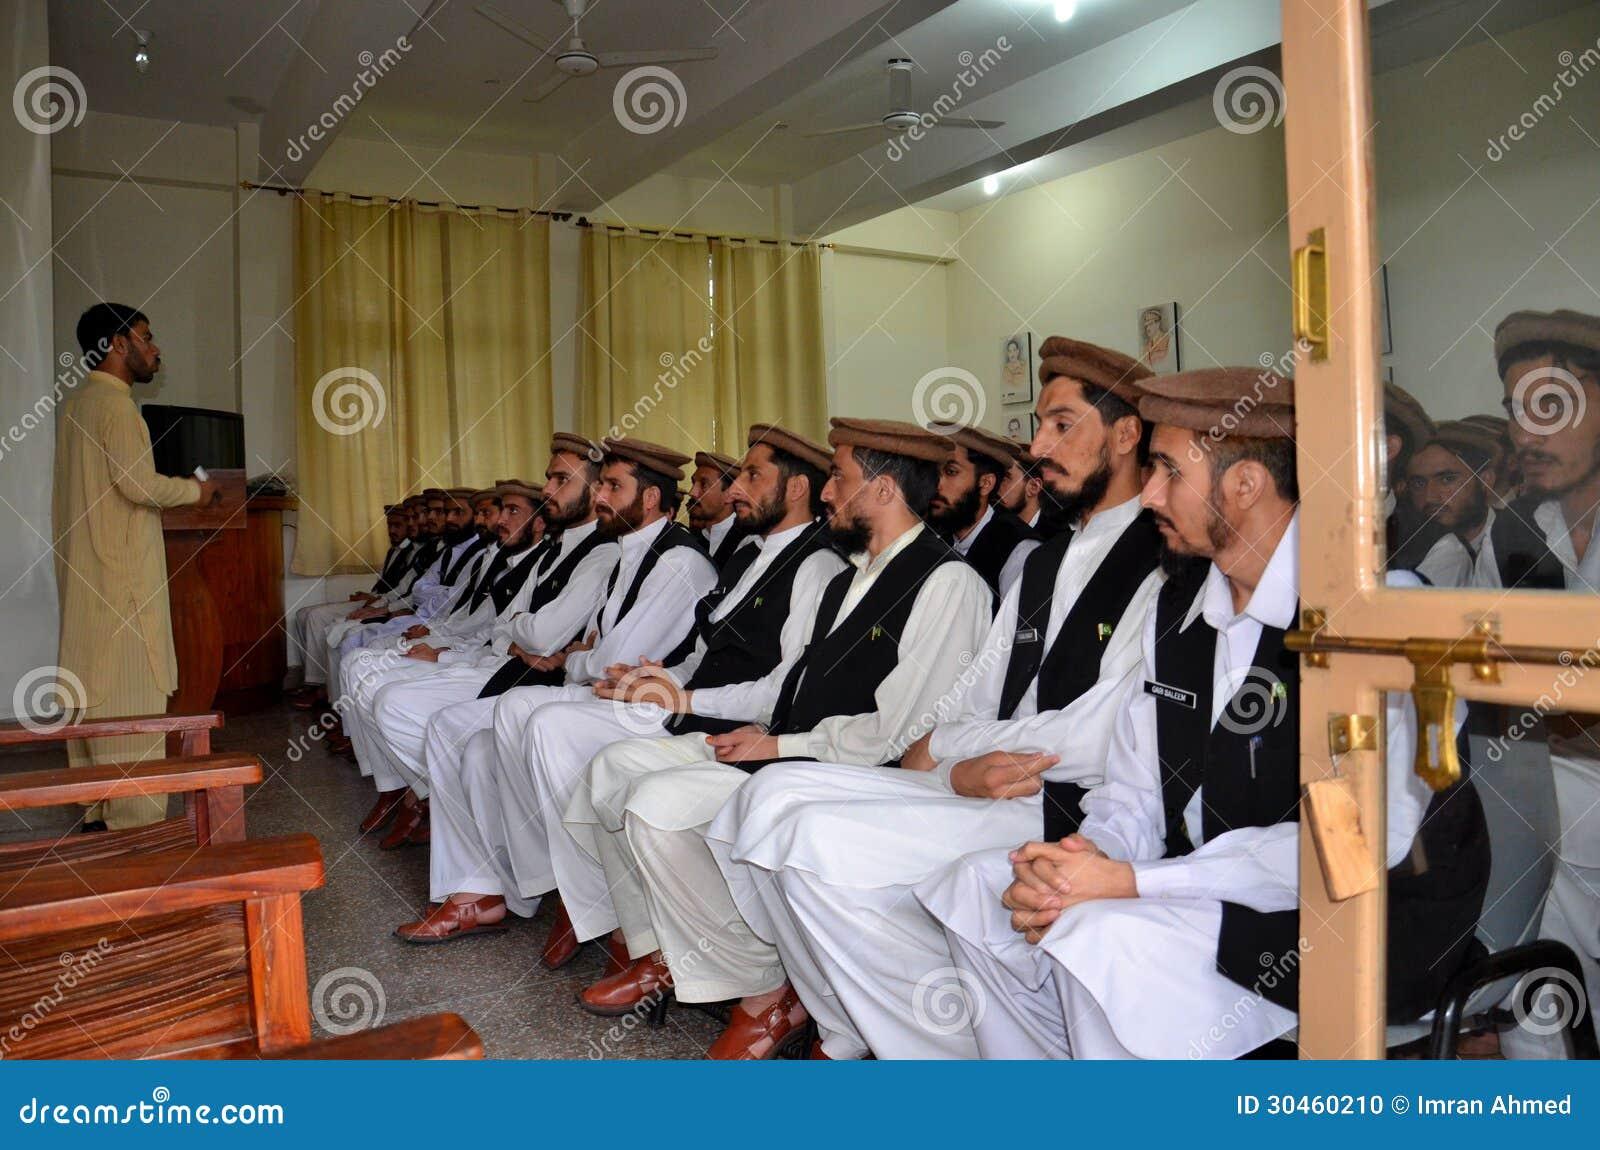 de radicalization programs used to combat islamist Pathways to de-radicalization– ict16  forward to combat islamic radicalization within detention centers  topic of methods and de-radicalization programs that .